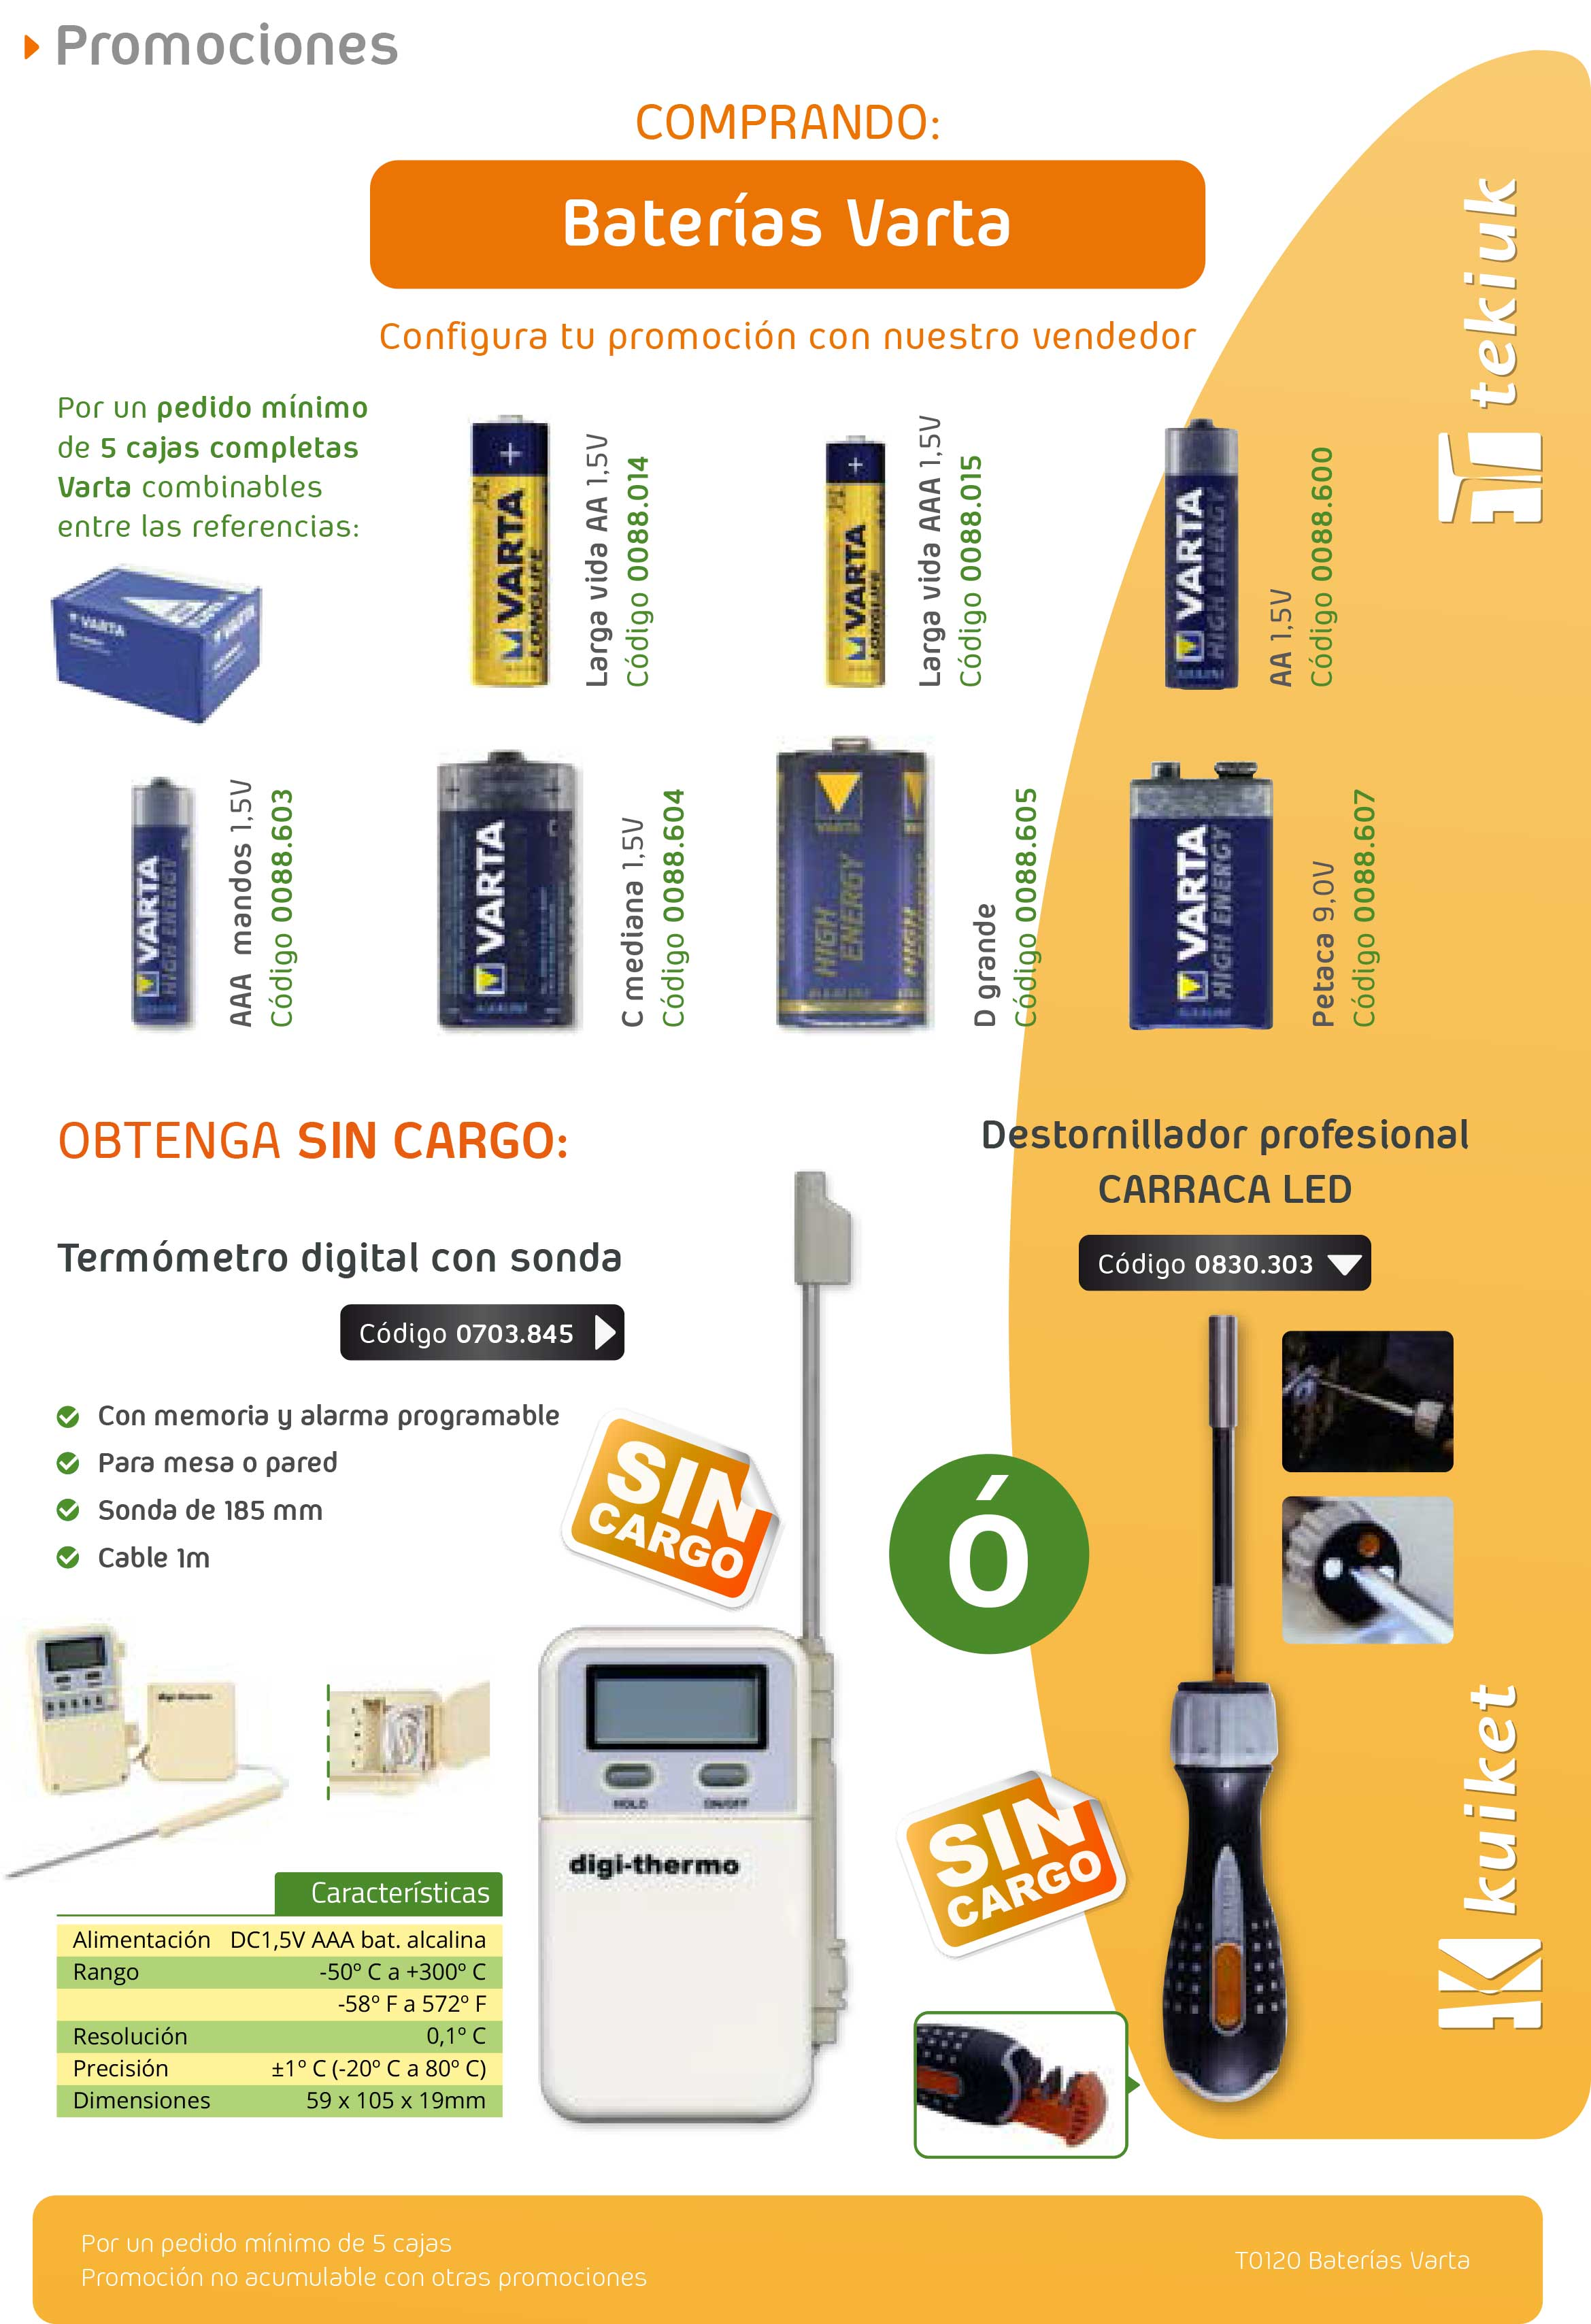 T0120 Baterias Varta